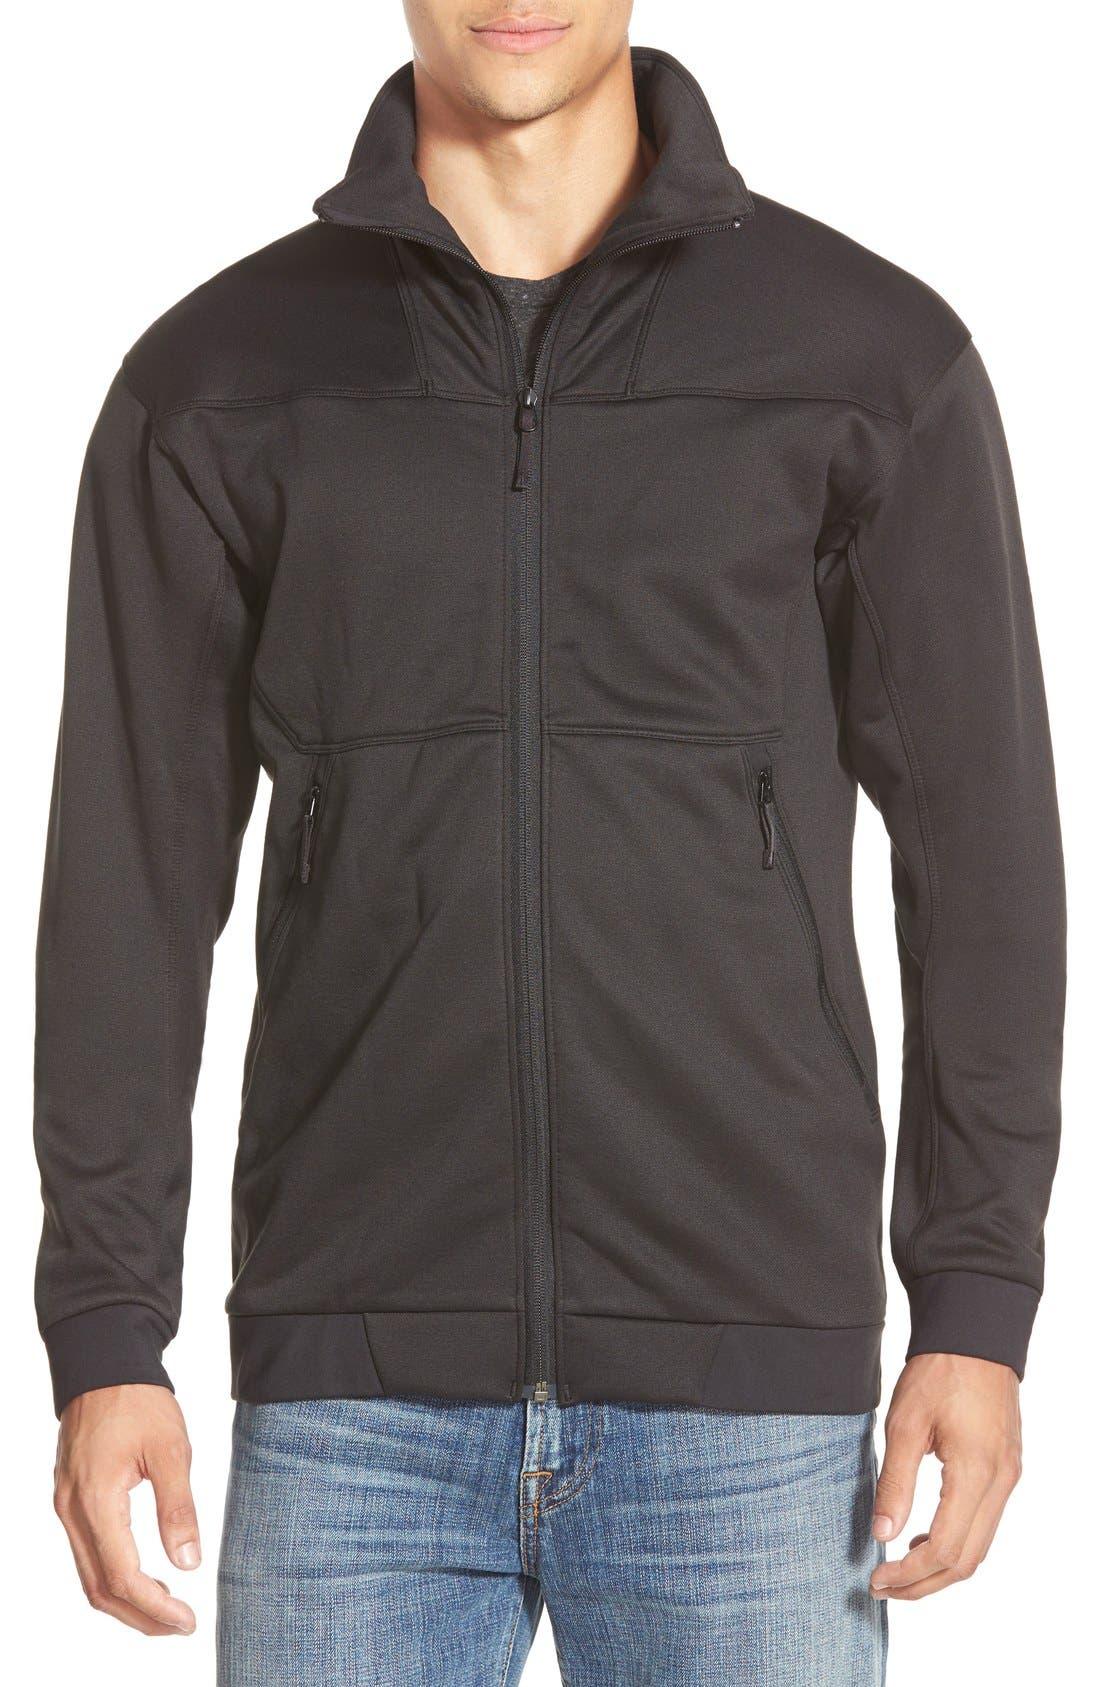 'Straibo' Midweight Technical Fleece Jacket, Main, color, 001